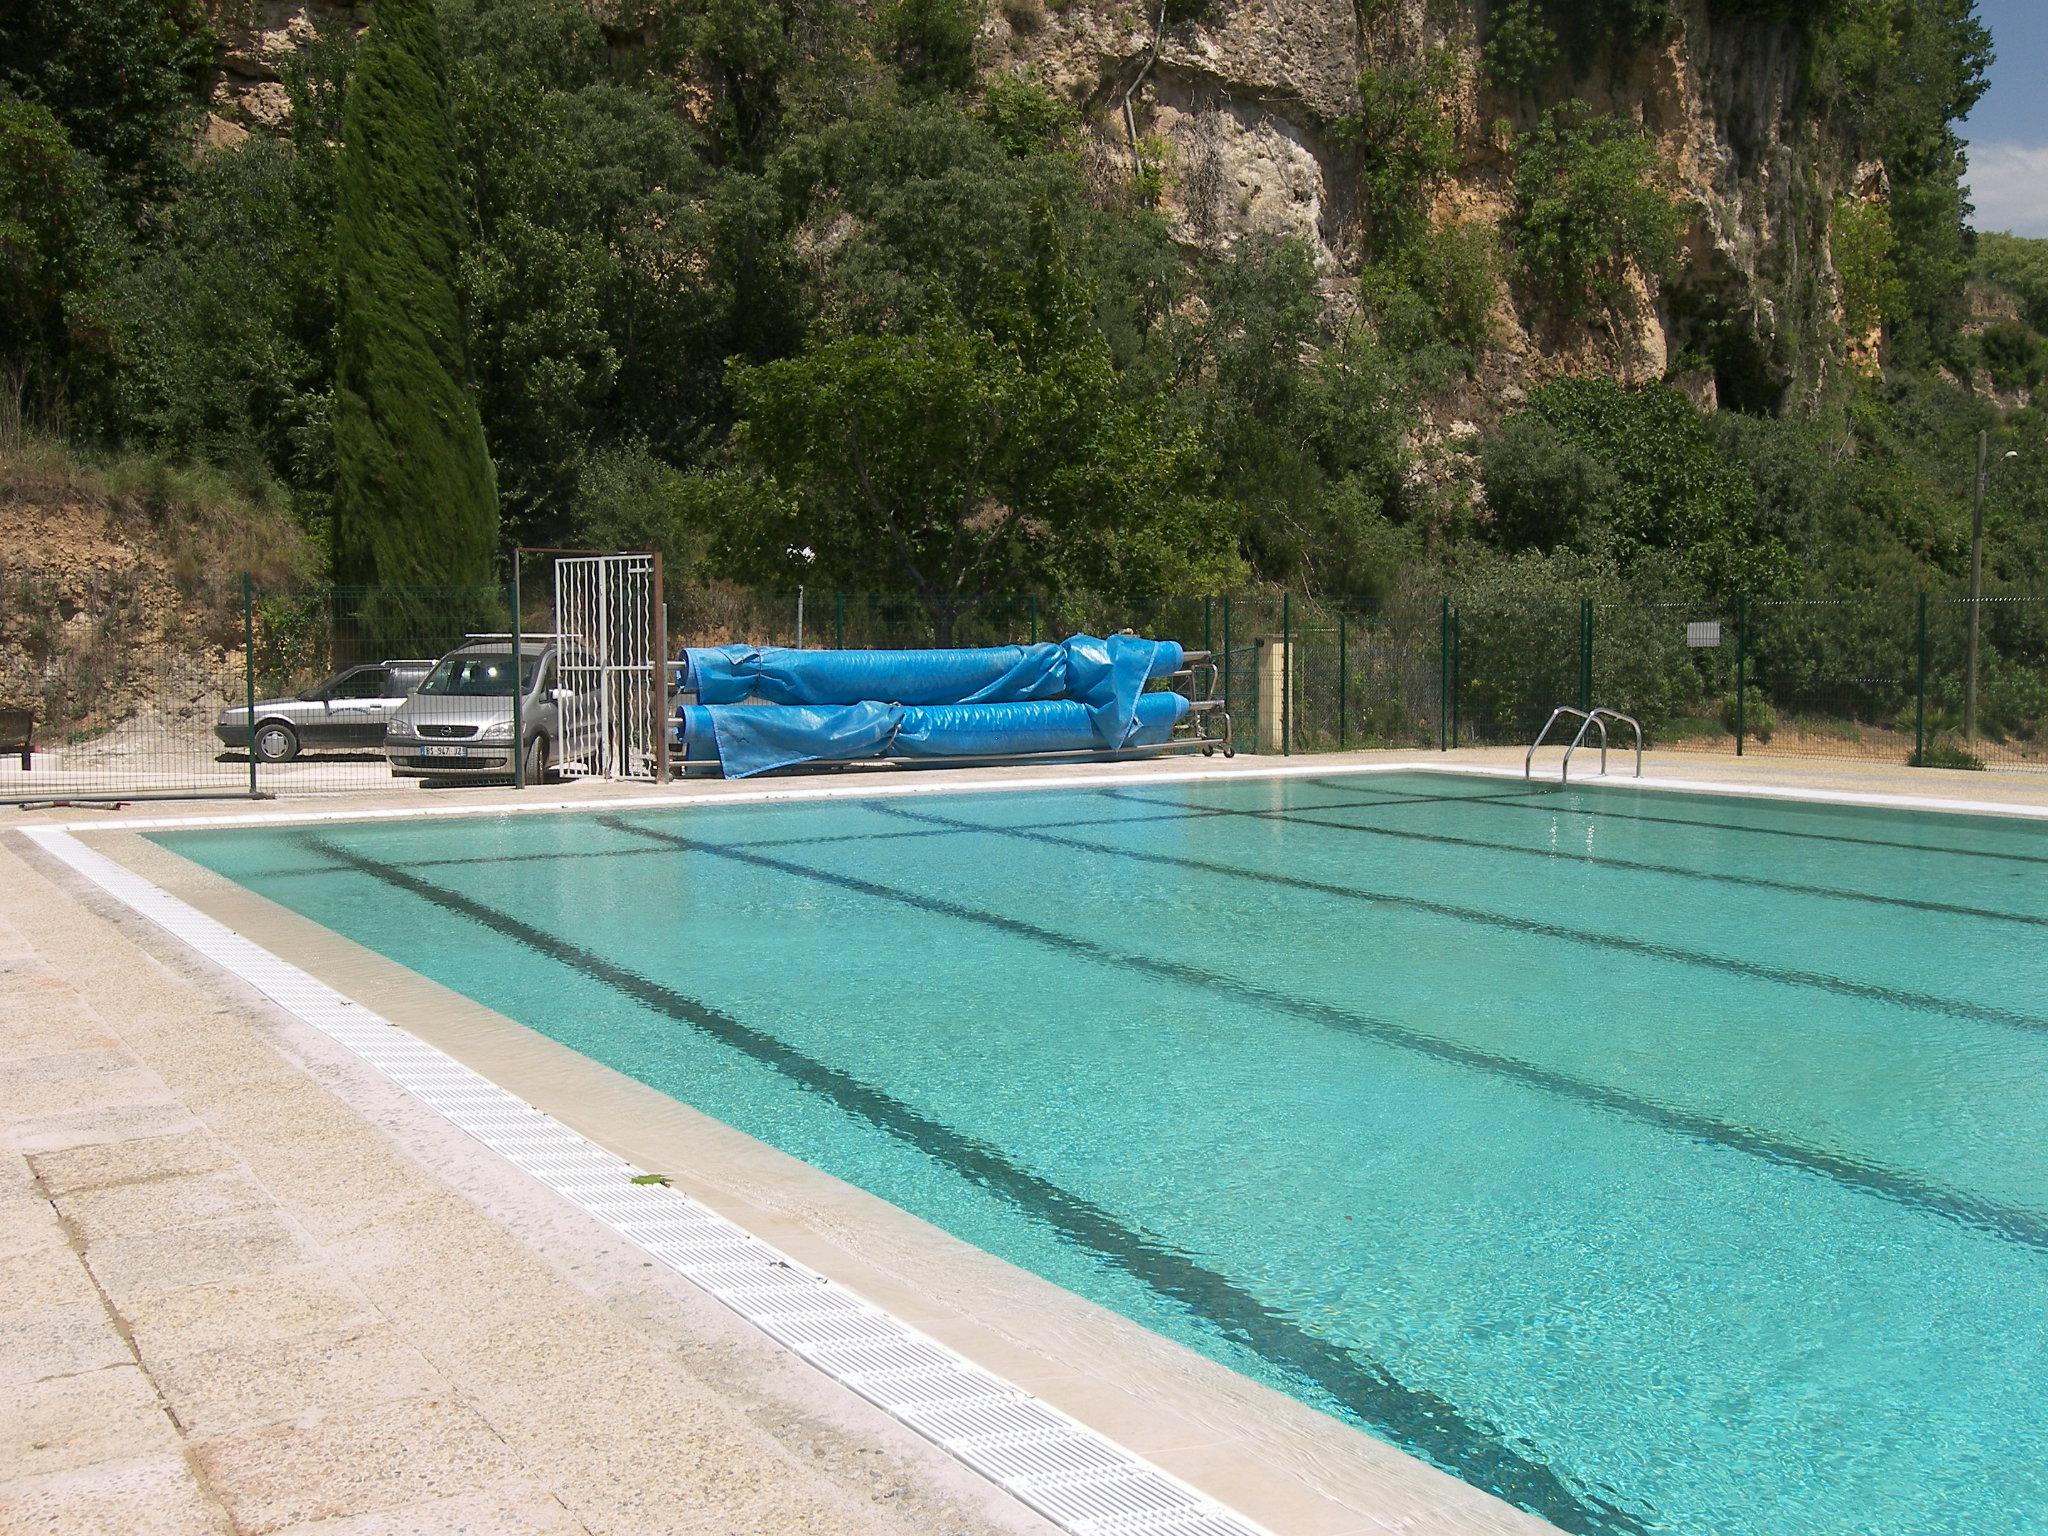 La piscine collective piscines traditionnelles brignoles for Construction piscine municipale